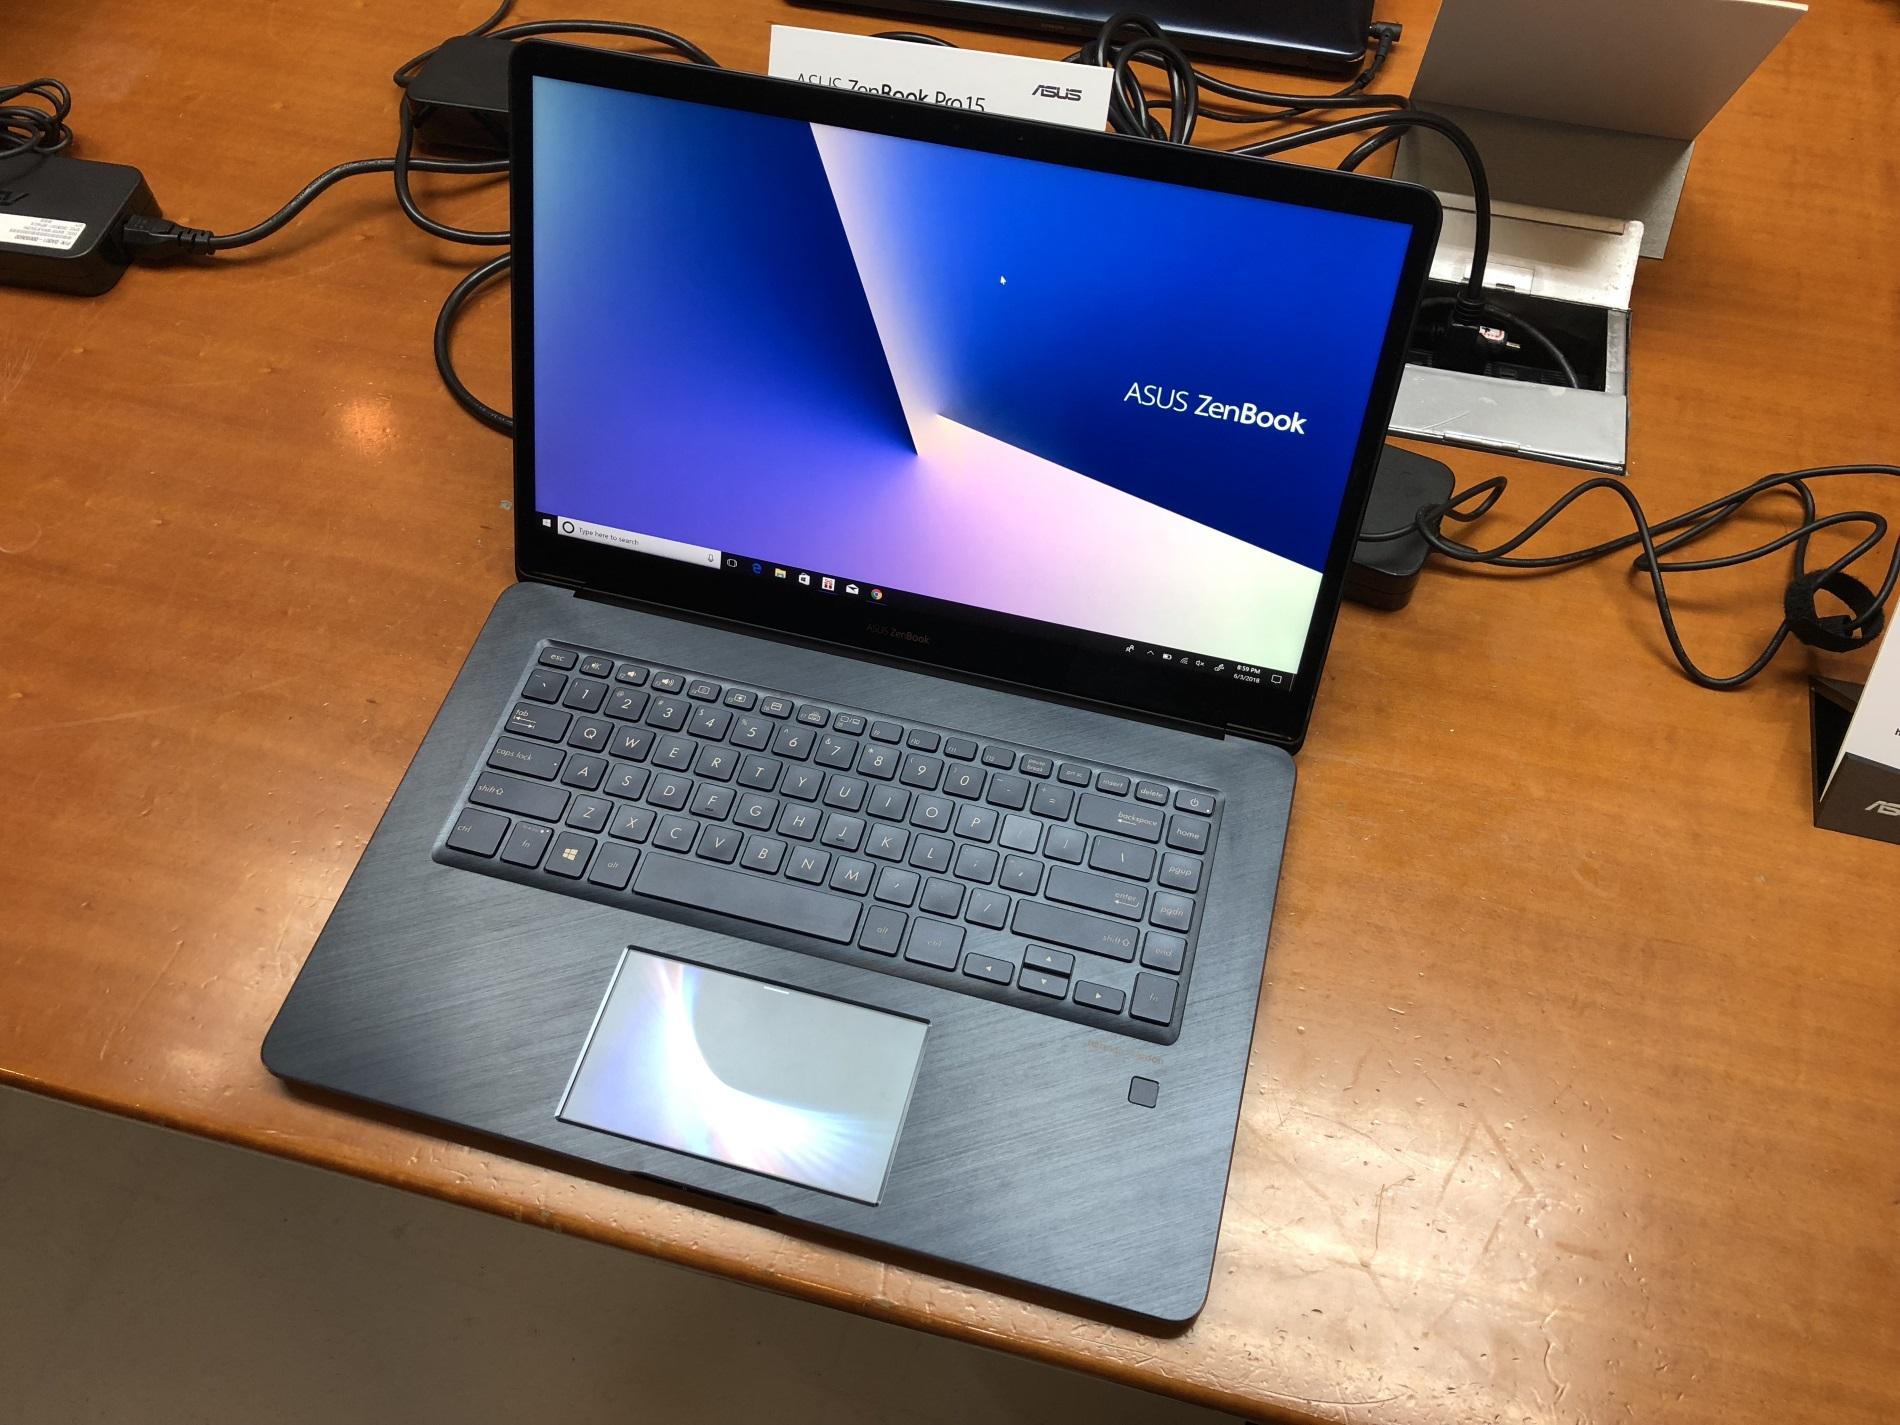 Bureau en gros zenbook asus zenbook buy or sell laptop 💻 or